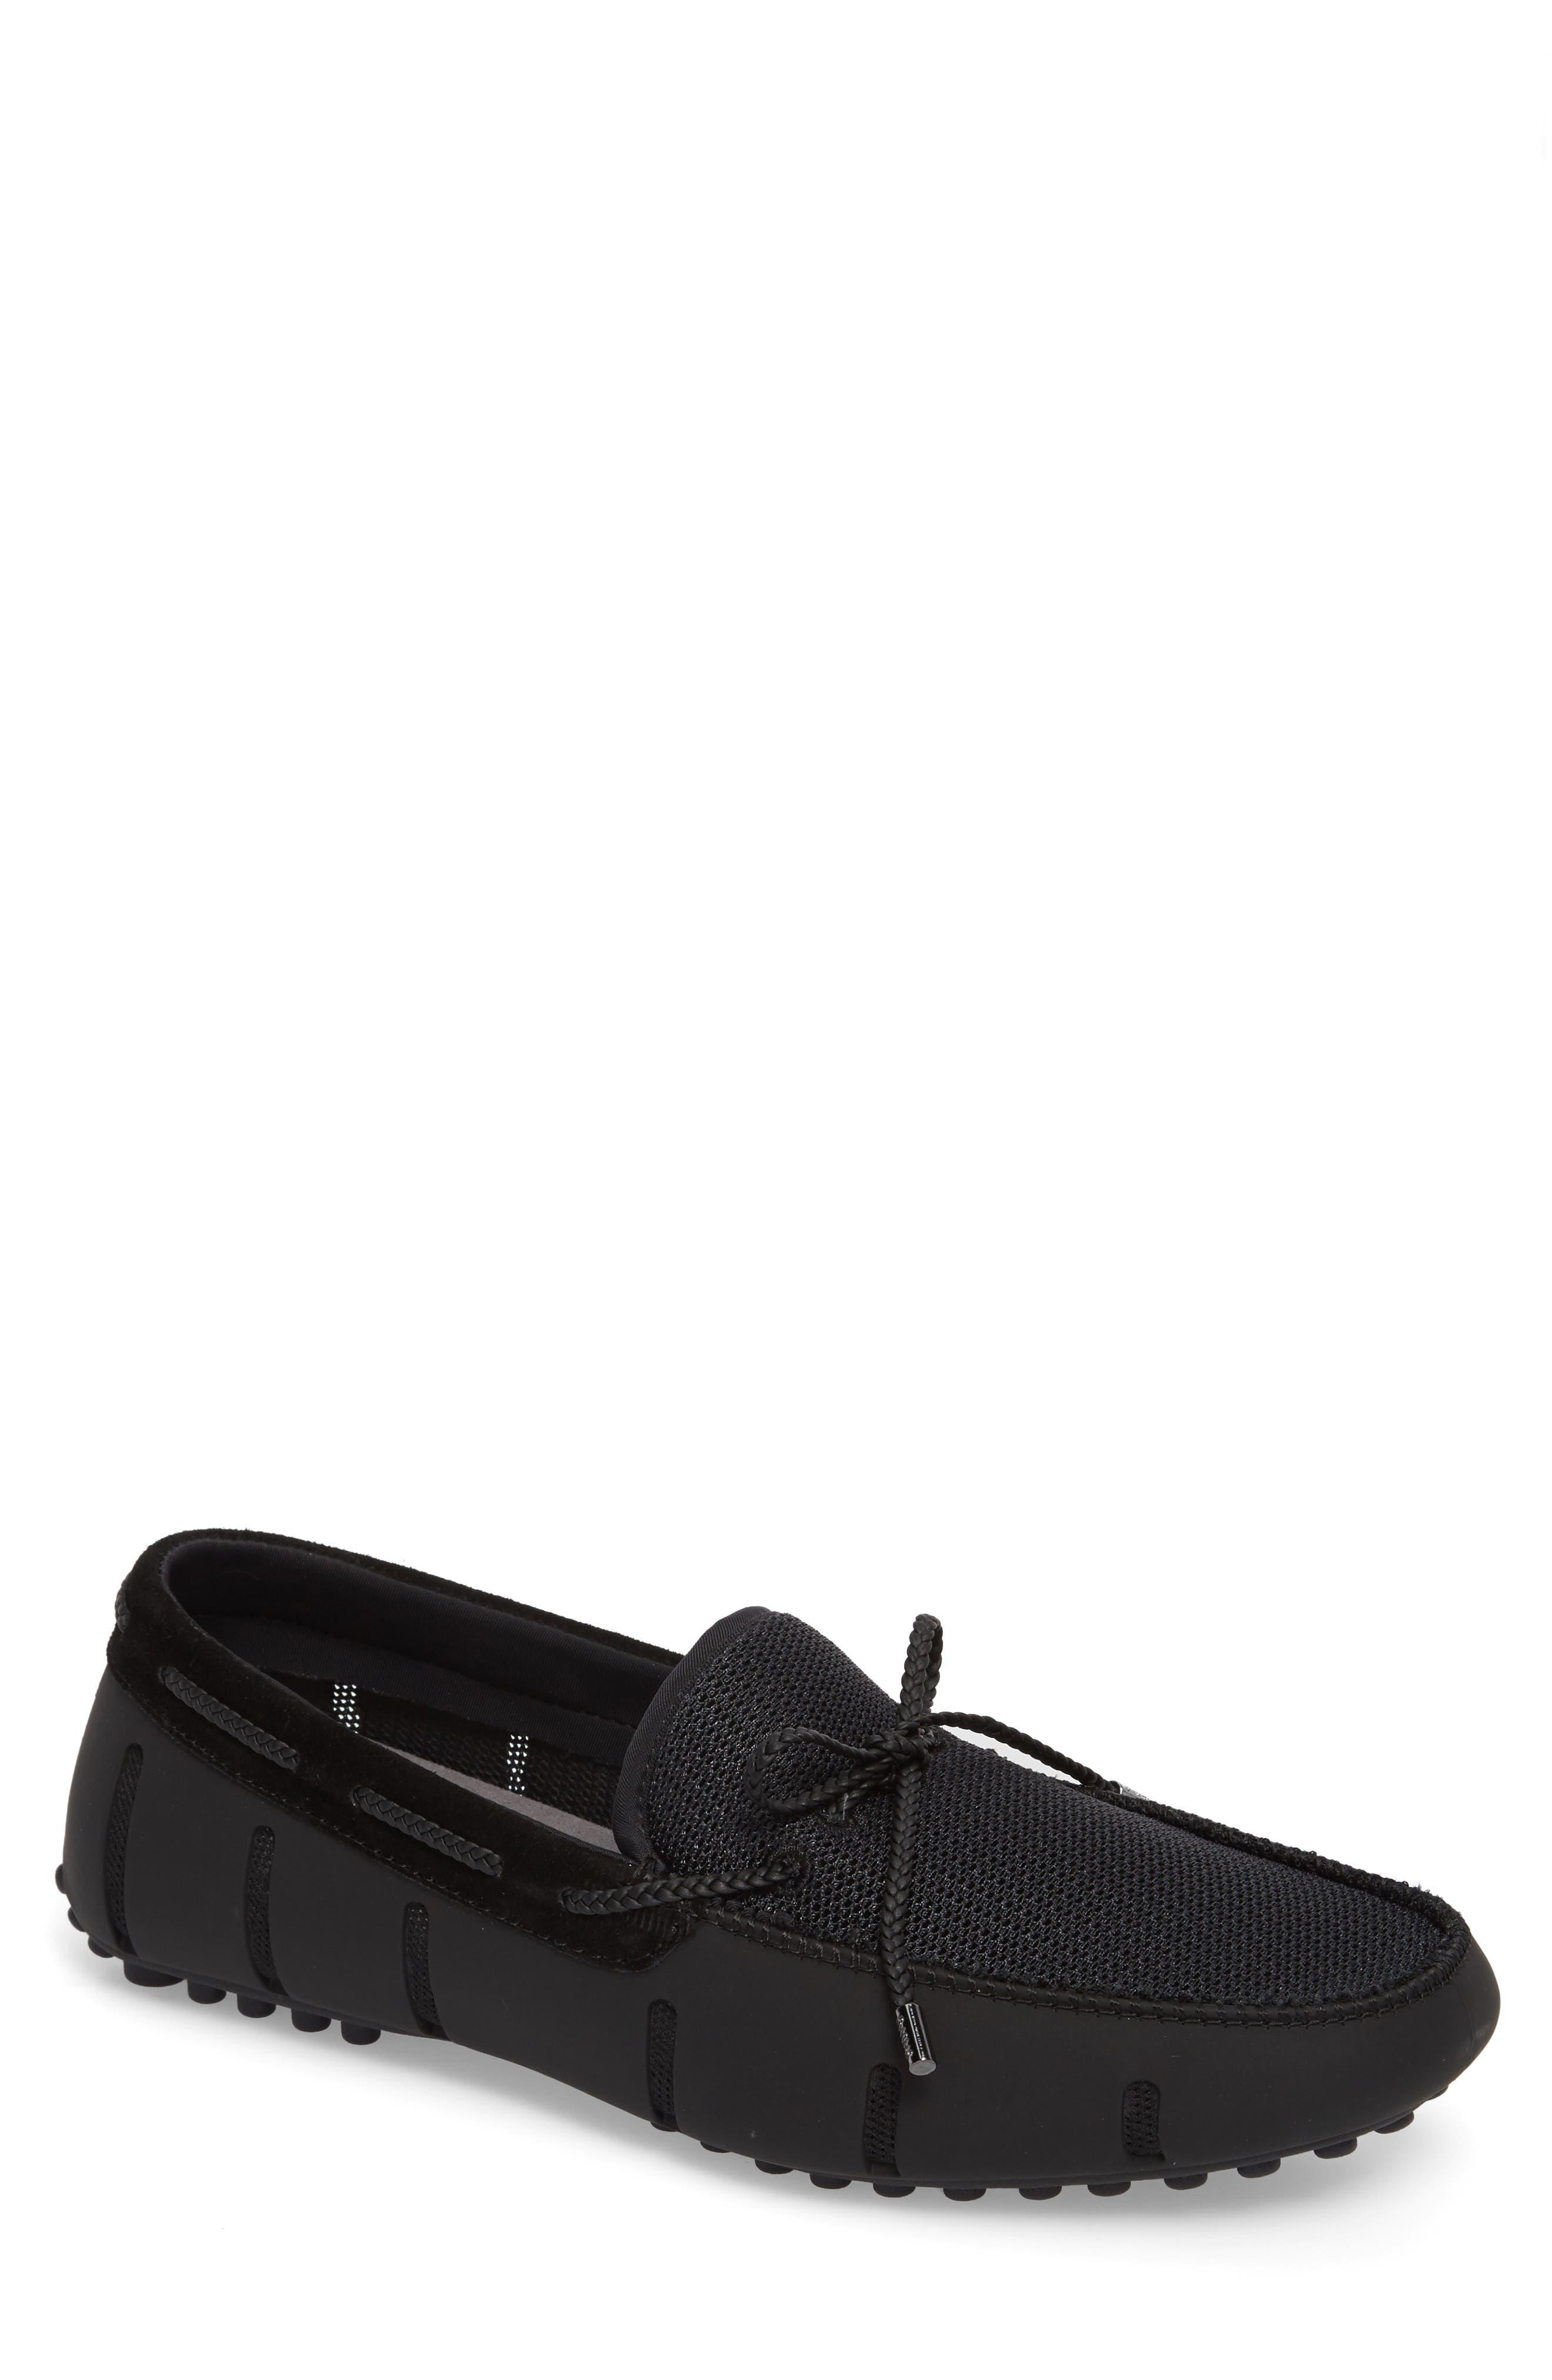 Driving Shoe,                             Main thumbnail 1, color,                             Black/ Graphite